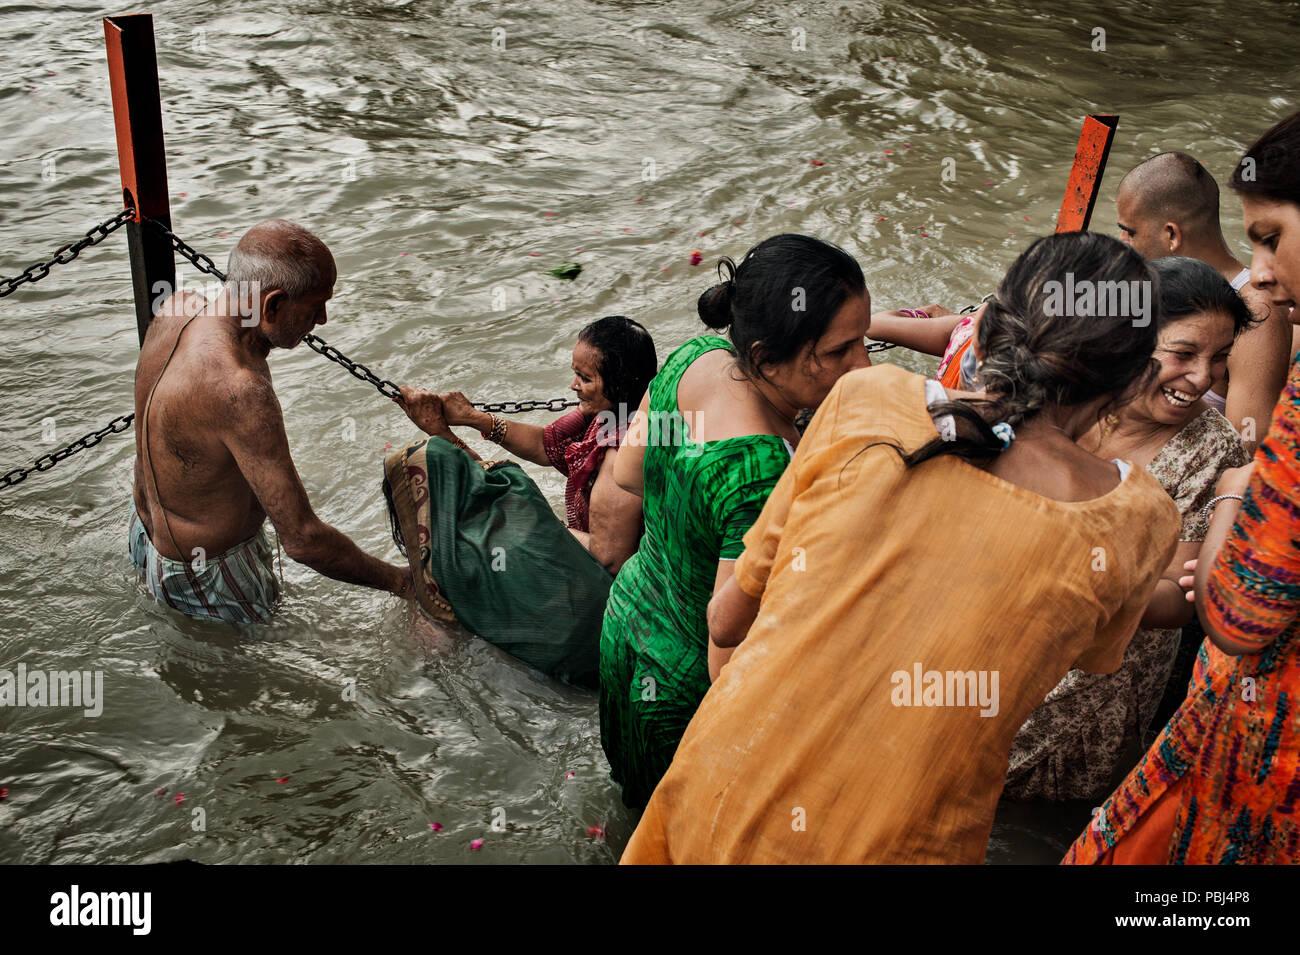 Pellegrini indu bagnarsi nel Gange a Haridwar, India Immagini Stock